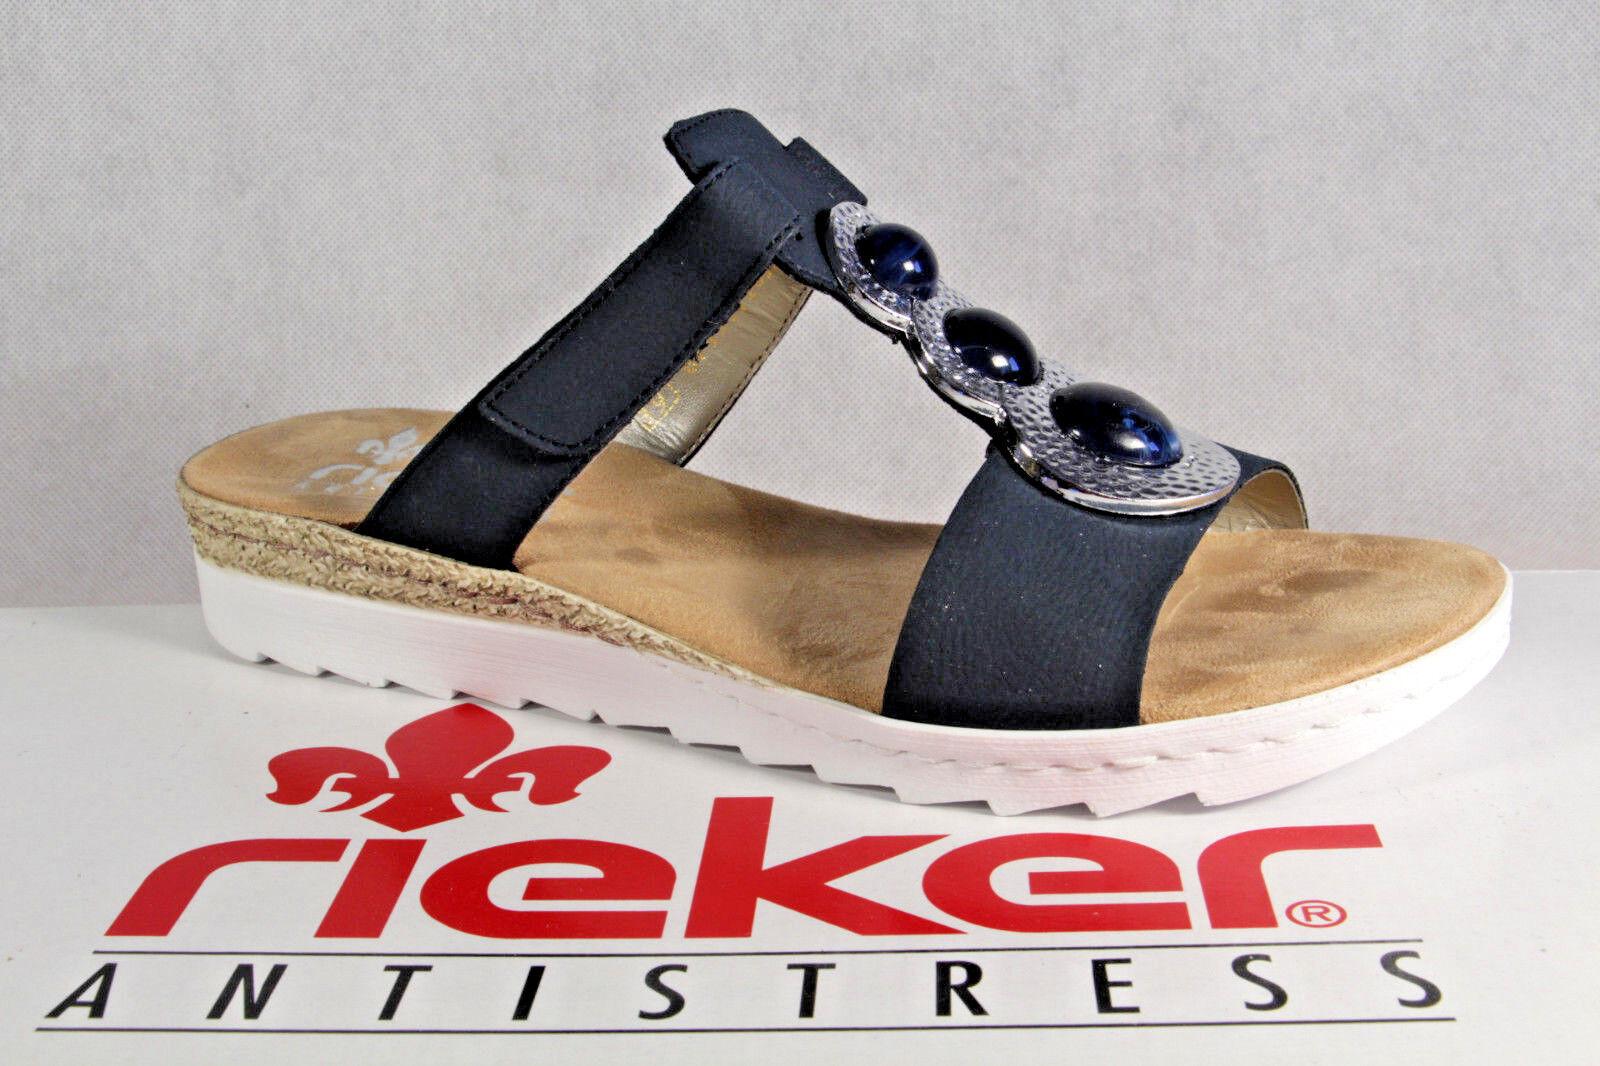 Rieker Seali Ciabatte Pantofola Blu, 63064 Nuovo